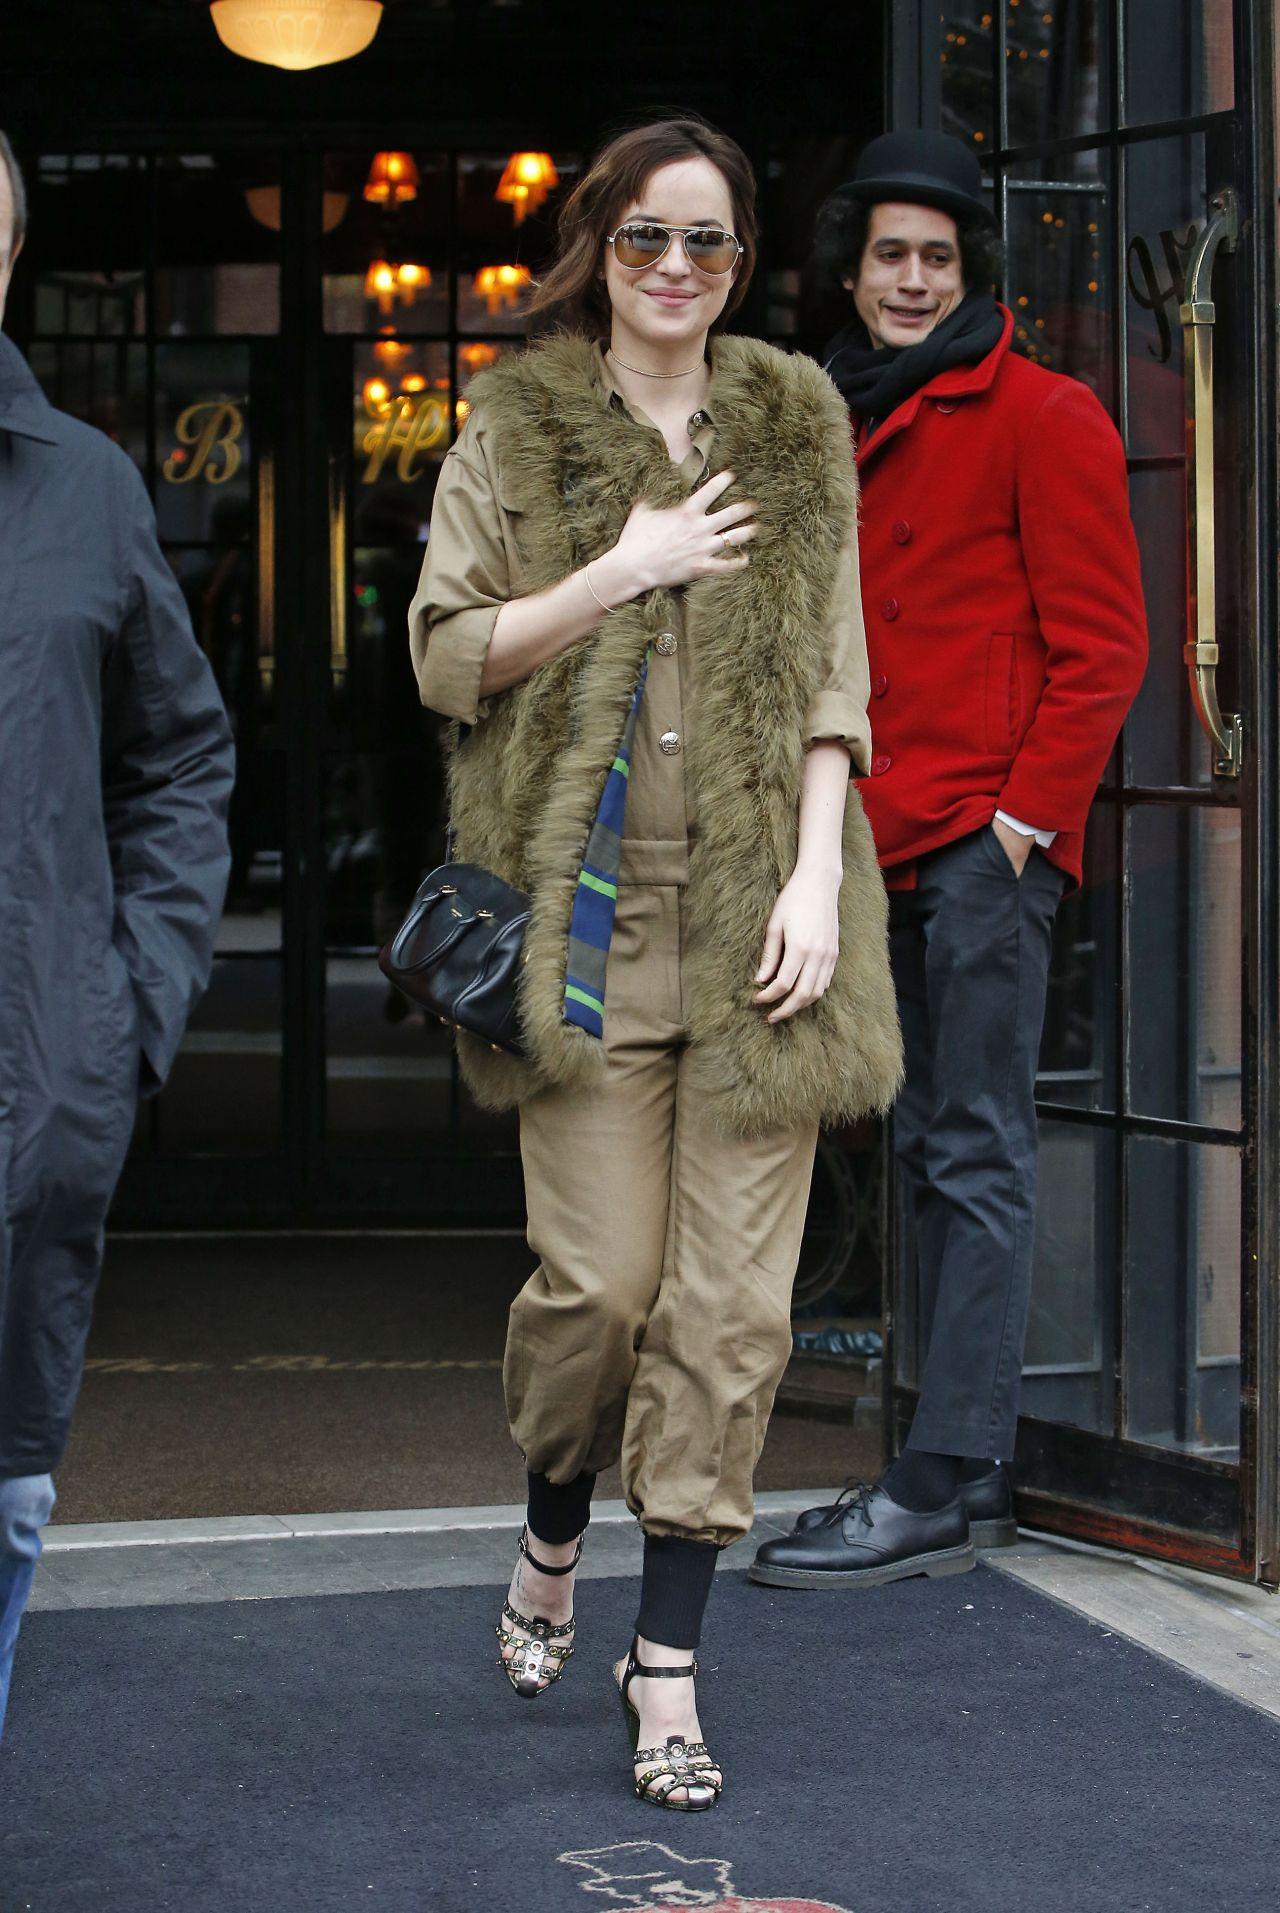 Dakota johnson leaving the bowery hotel in nyc nude (98 photos), Boobs Celebrites foto